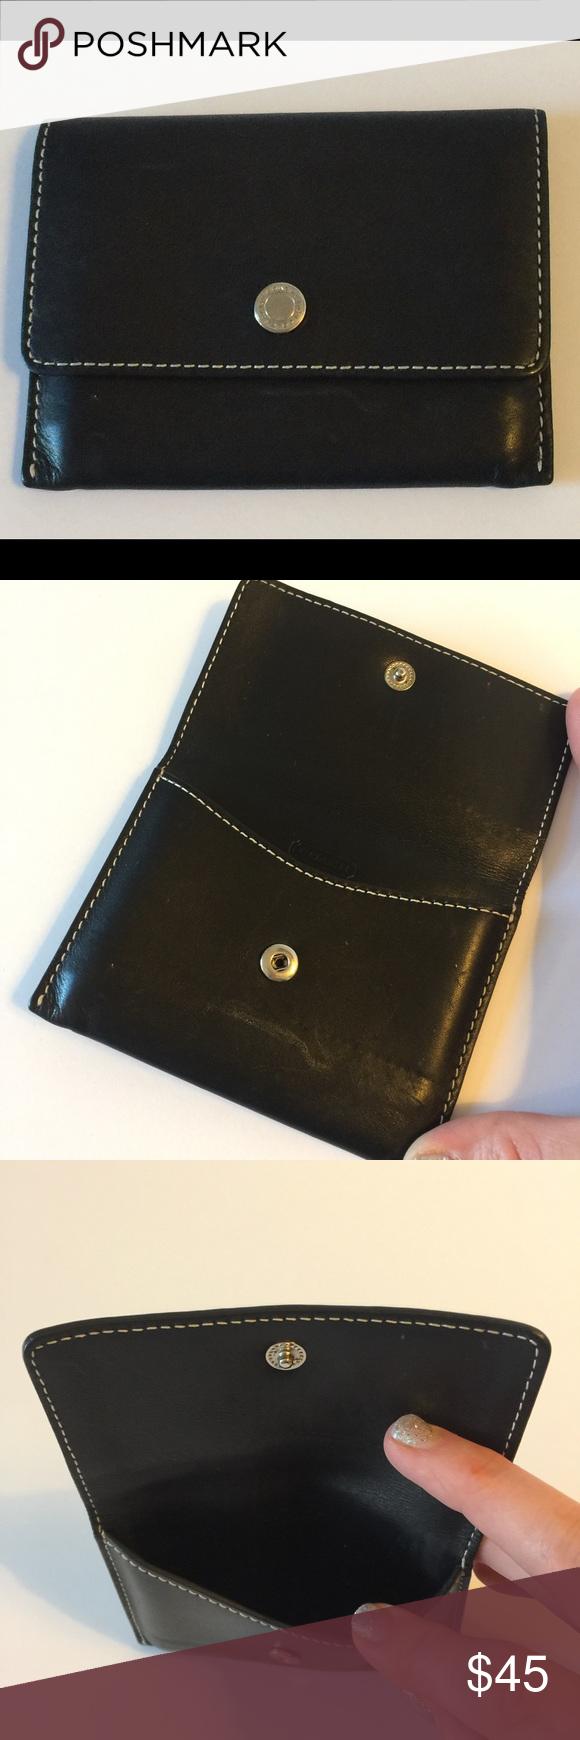 Coach business card / credit card holder | Key card holder, Emboss ...